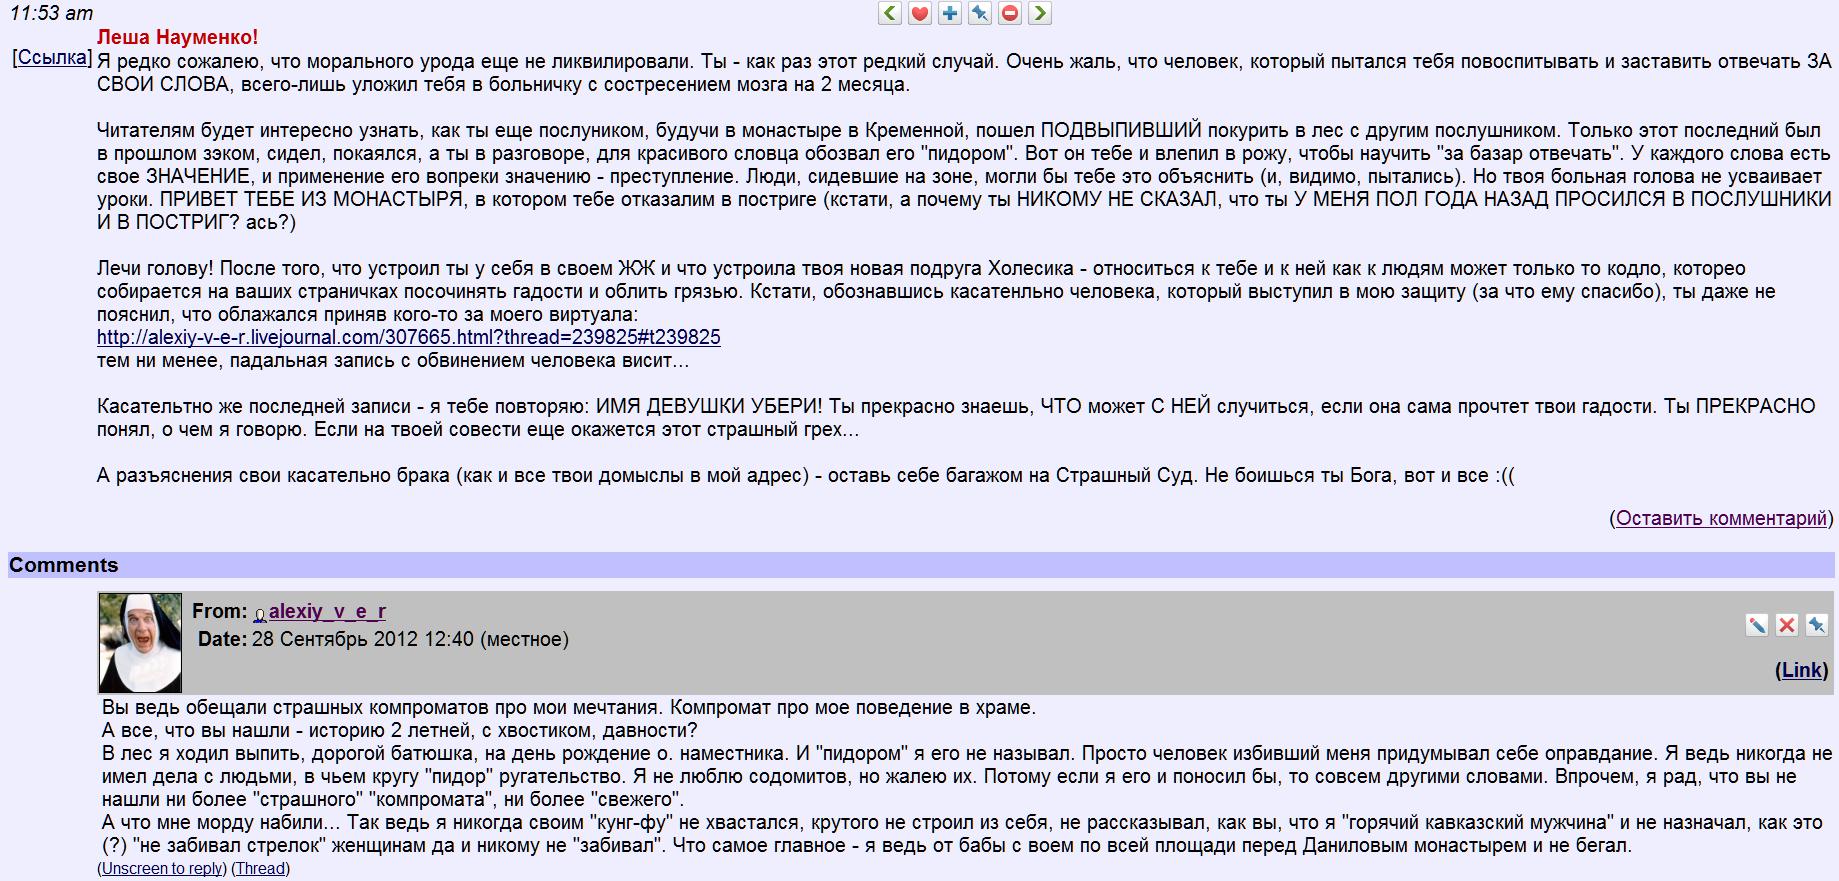 2012-09-28_124001